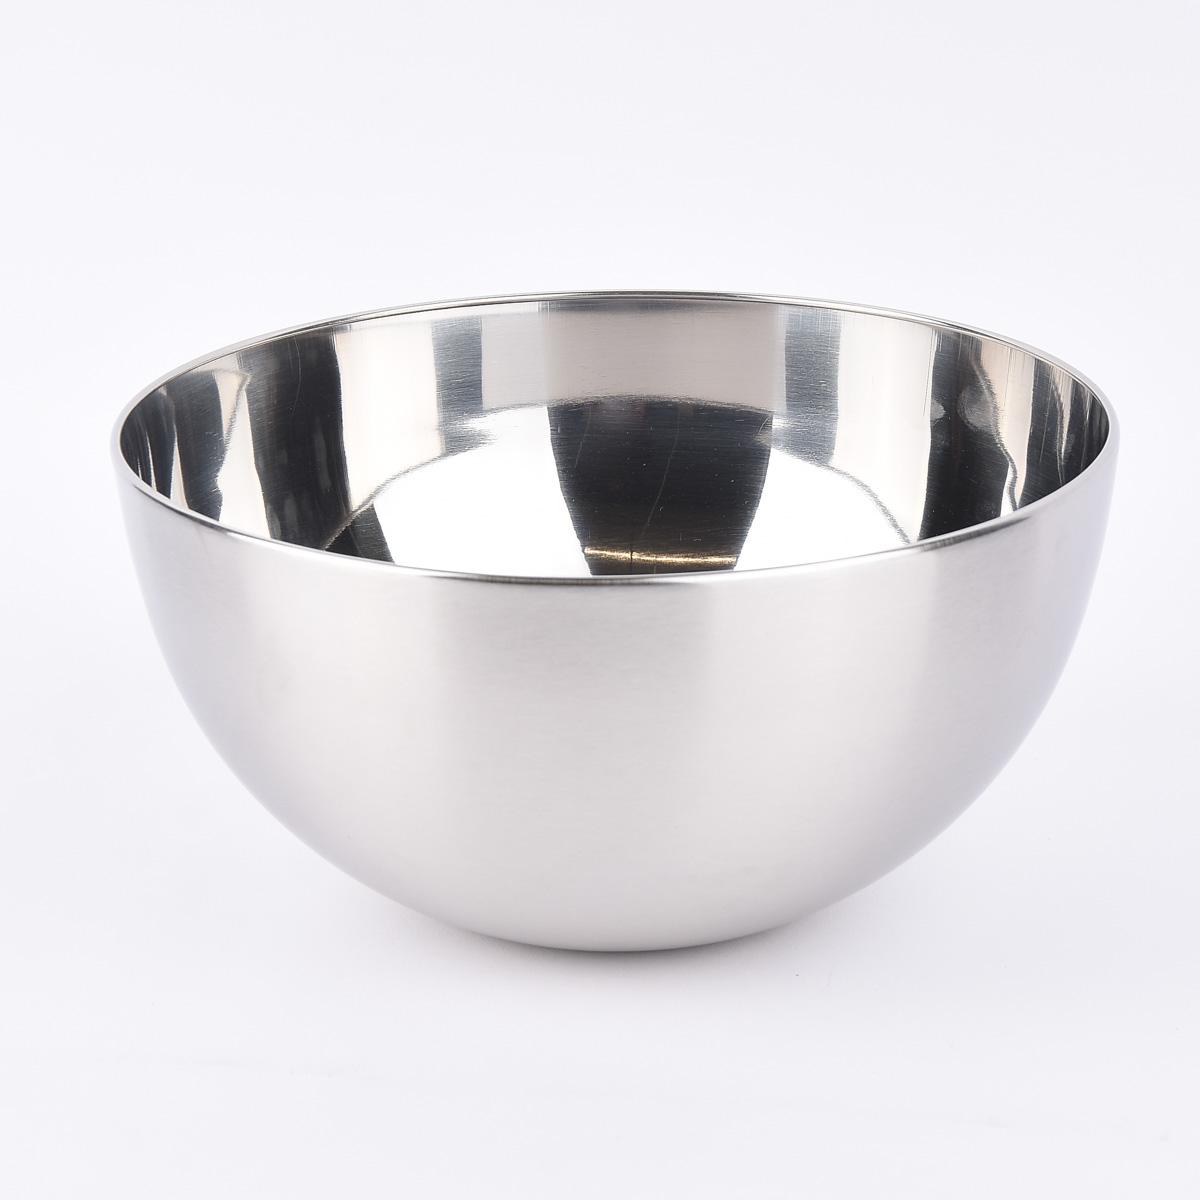 Schale Metall Edelstahloptik silberfarbig 23,5x12cm